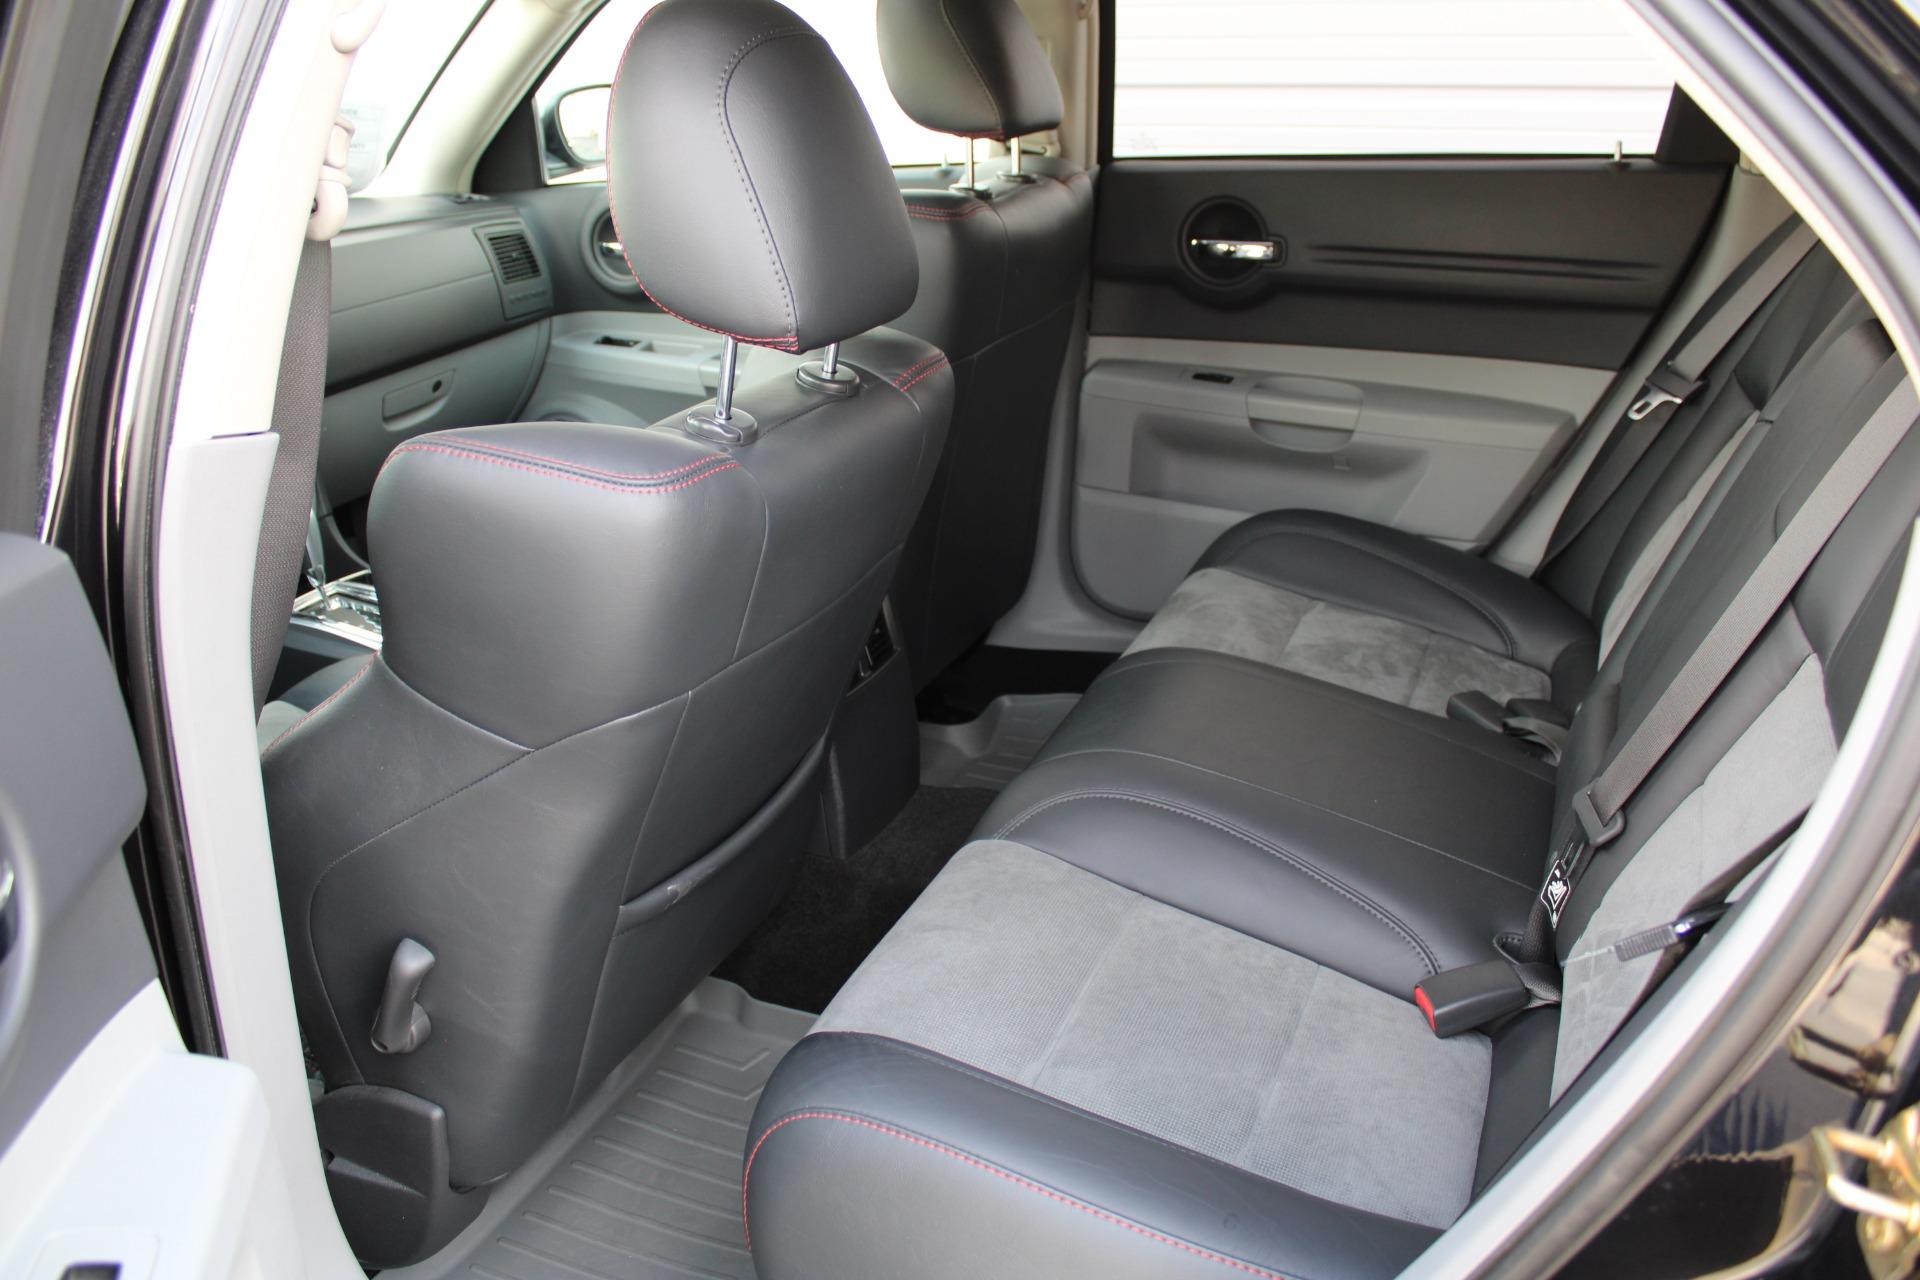 Used-2006-Dodge-Magnum-SRT8-Audi